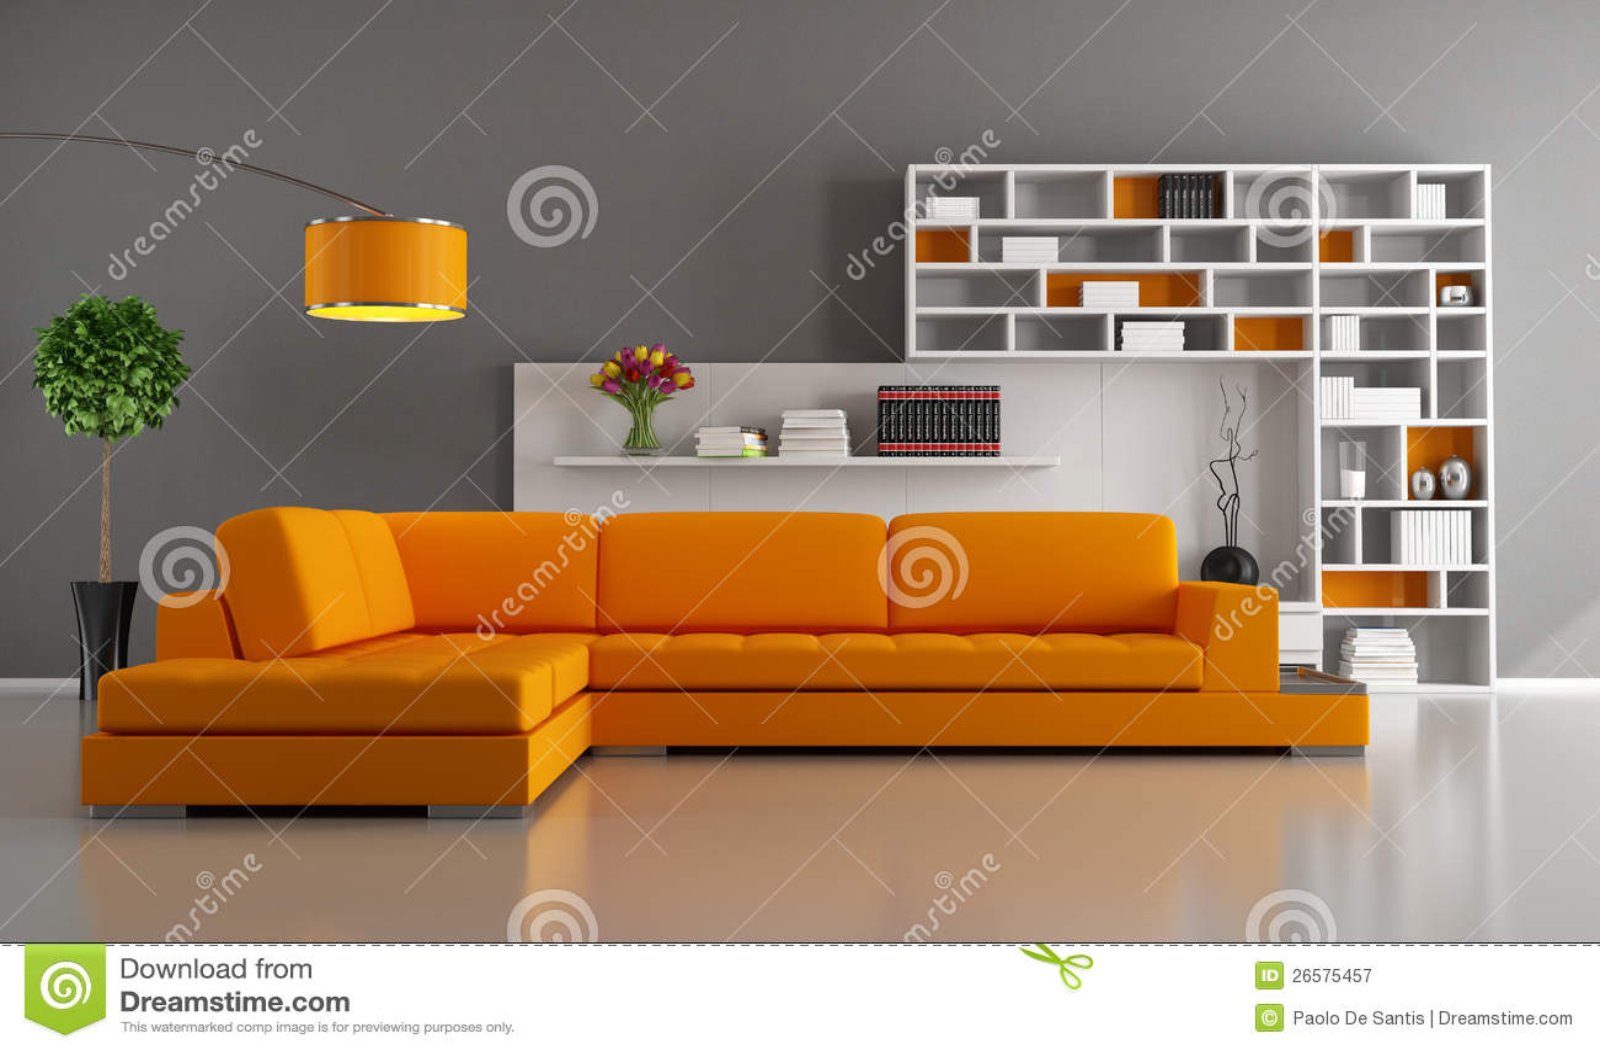 Oranje en bruine woonkamer stock illustratie afbeelding bestaande uit sinaasappel 26575457 - Afbeelding eigentijdse woonkamer ...